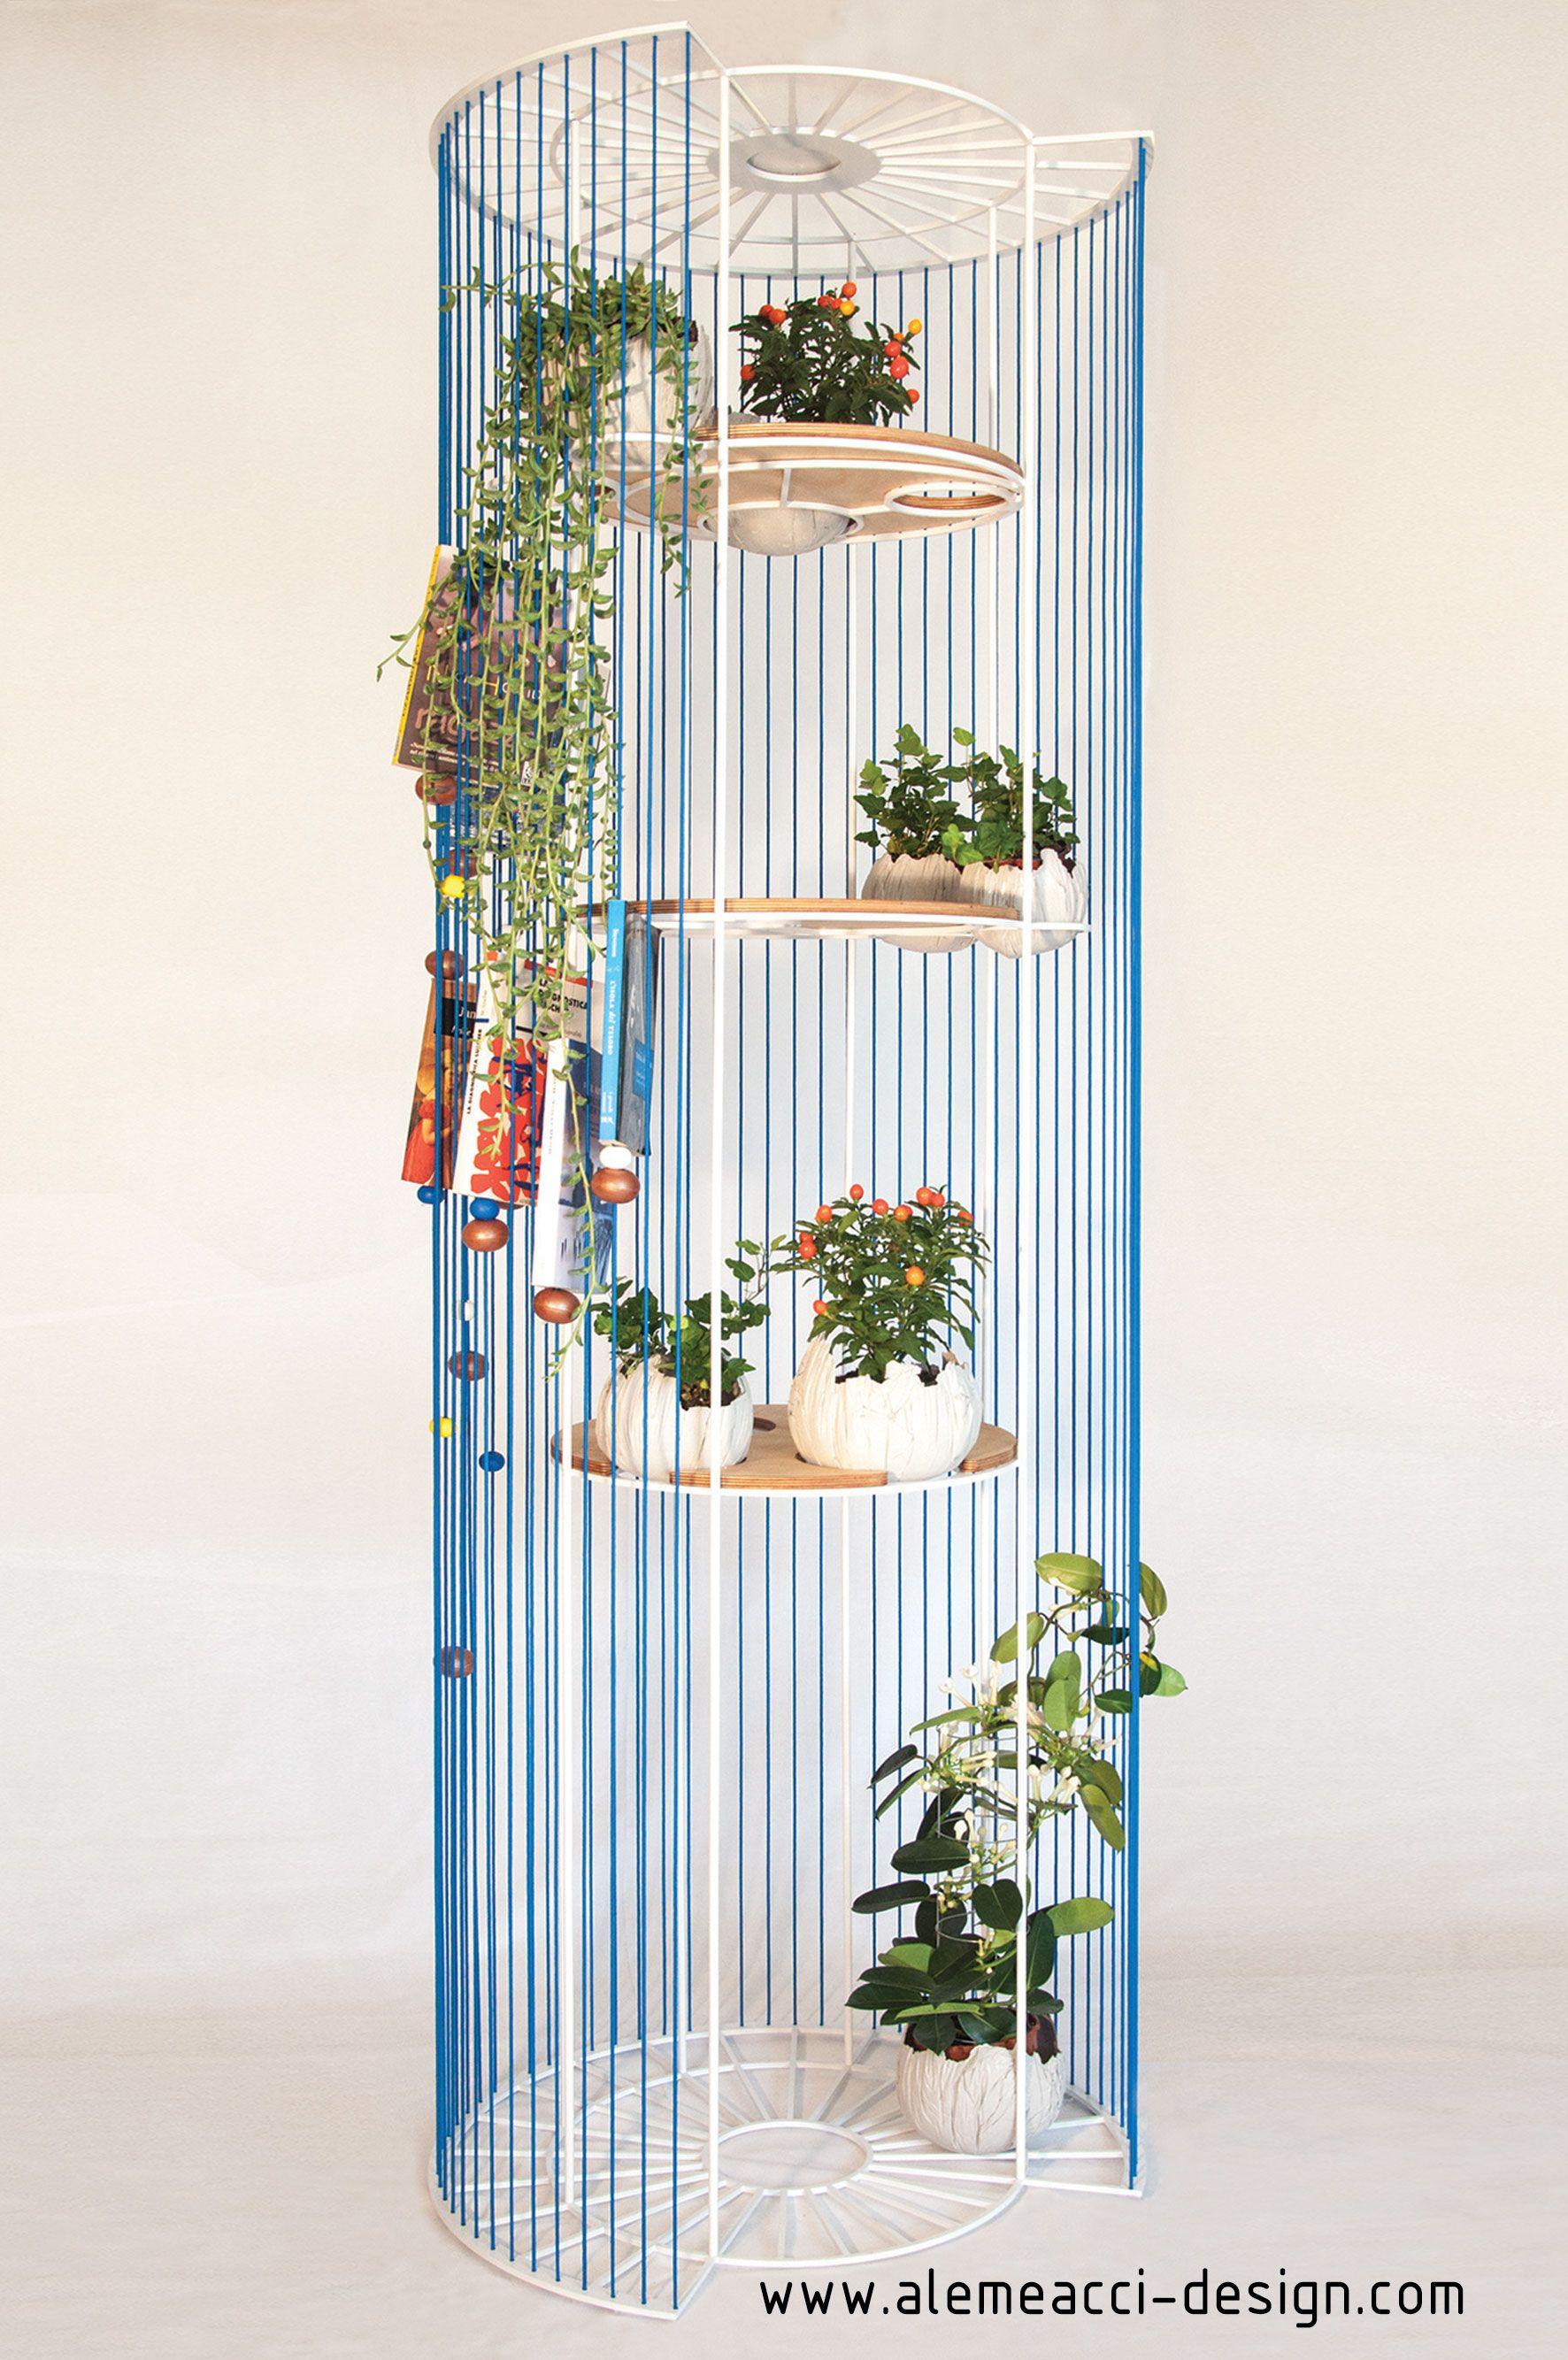 Urban jungle in your house a stringshelf to grow a vertical garden